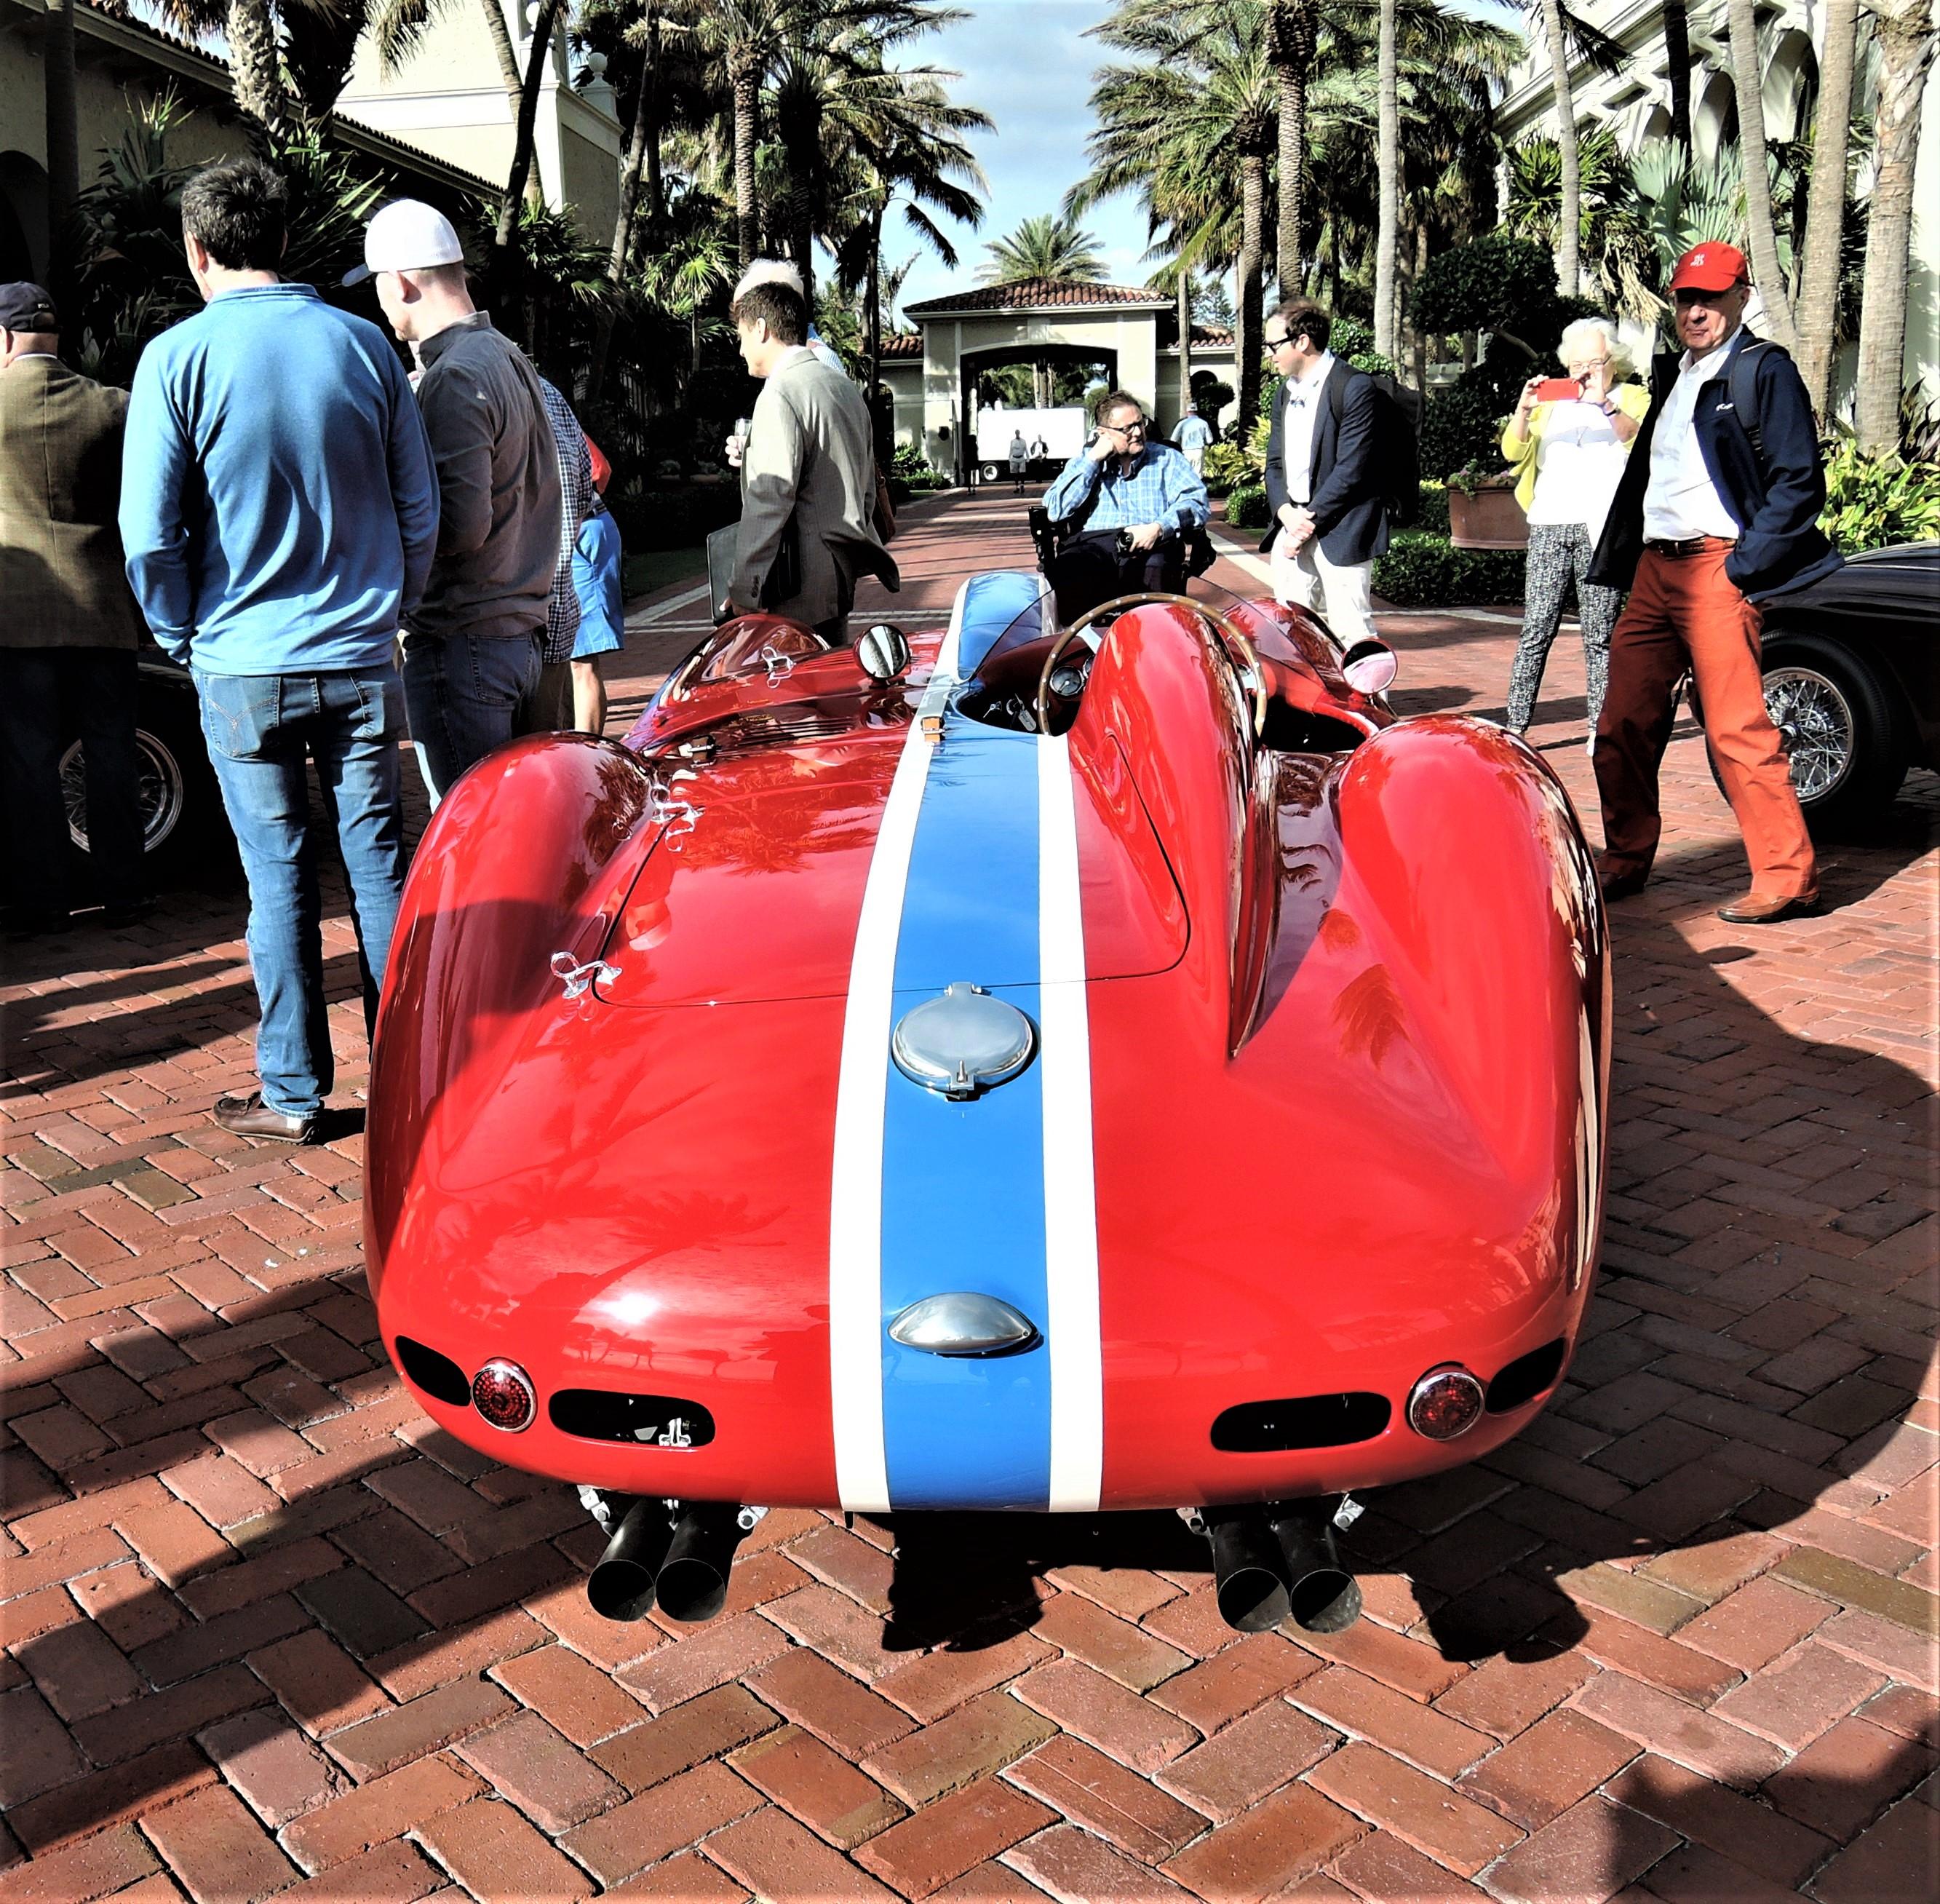 1955 Ferrari 410 Sport Scaglietti Spyder; Sn 0592 CM